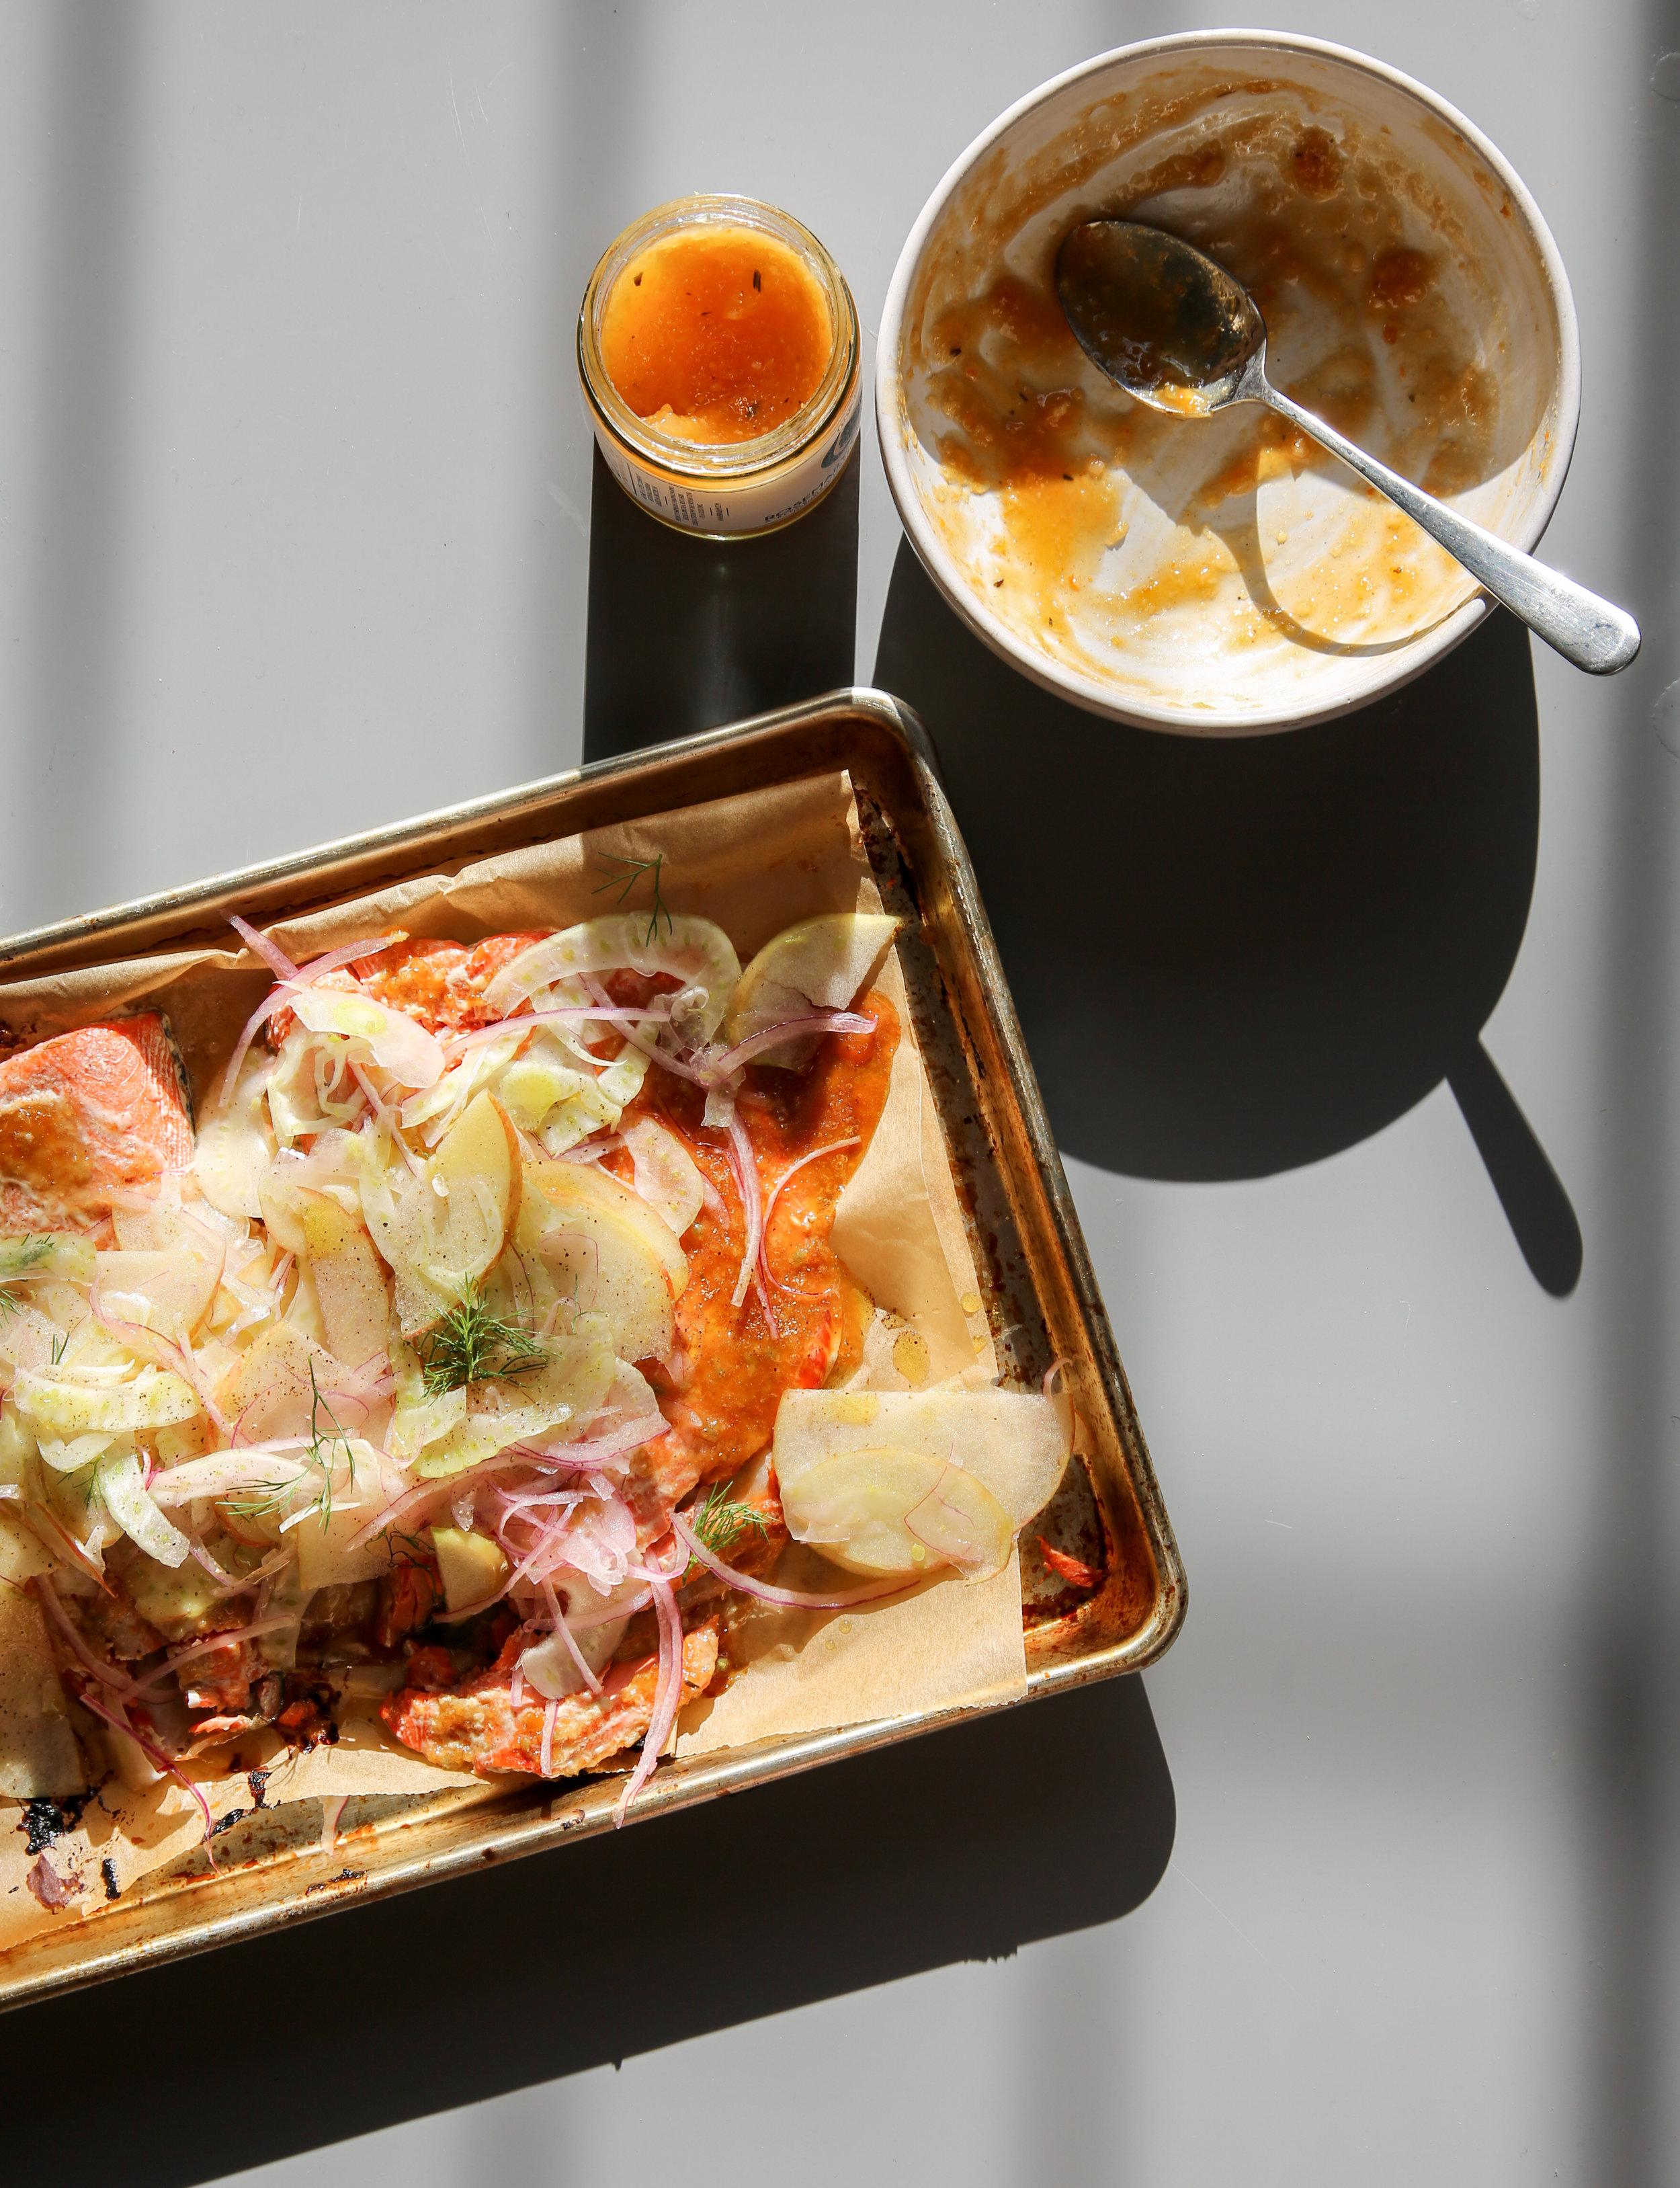 BRINS Rosemary Grapefruit Salmon Salad 1.JPG